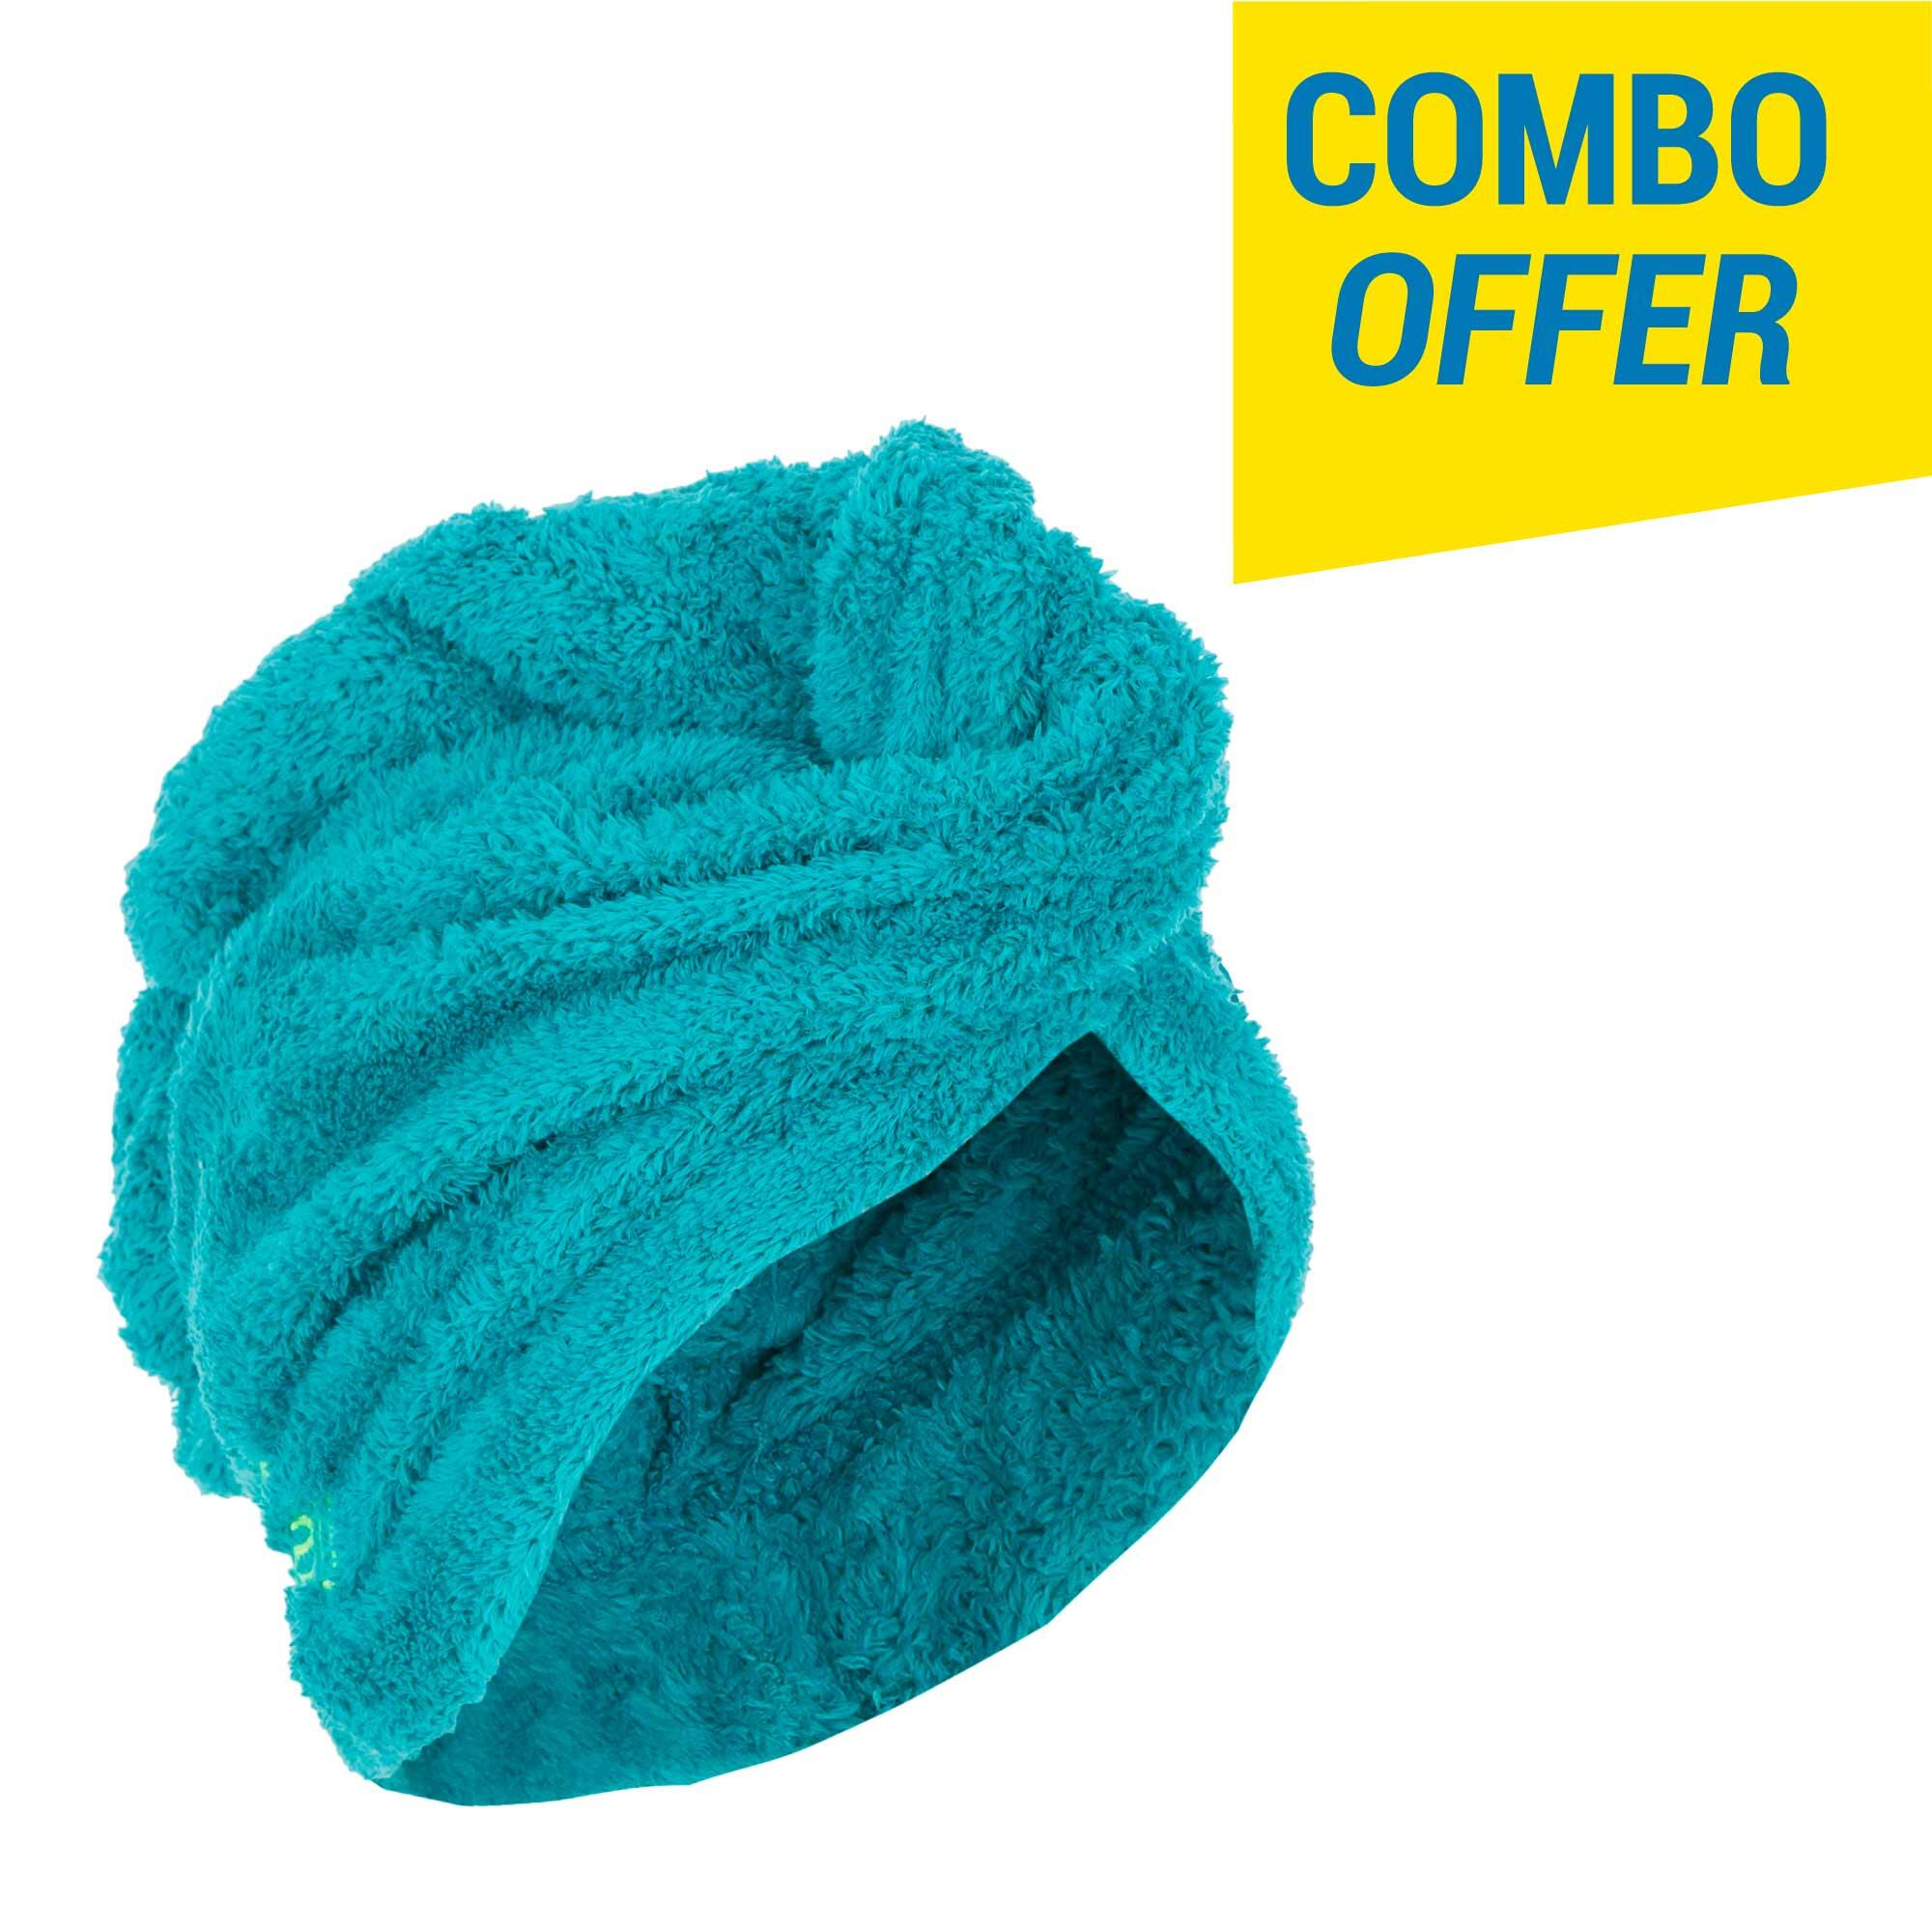 Swimming Soft Hair Towel - Sea Green